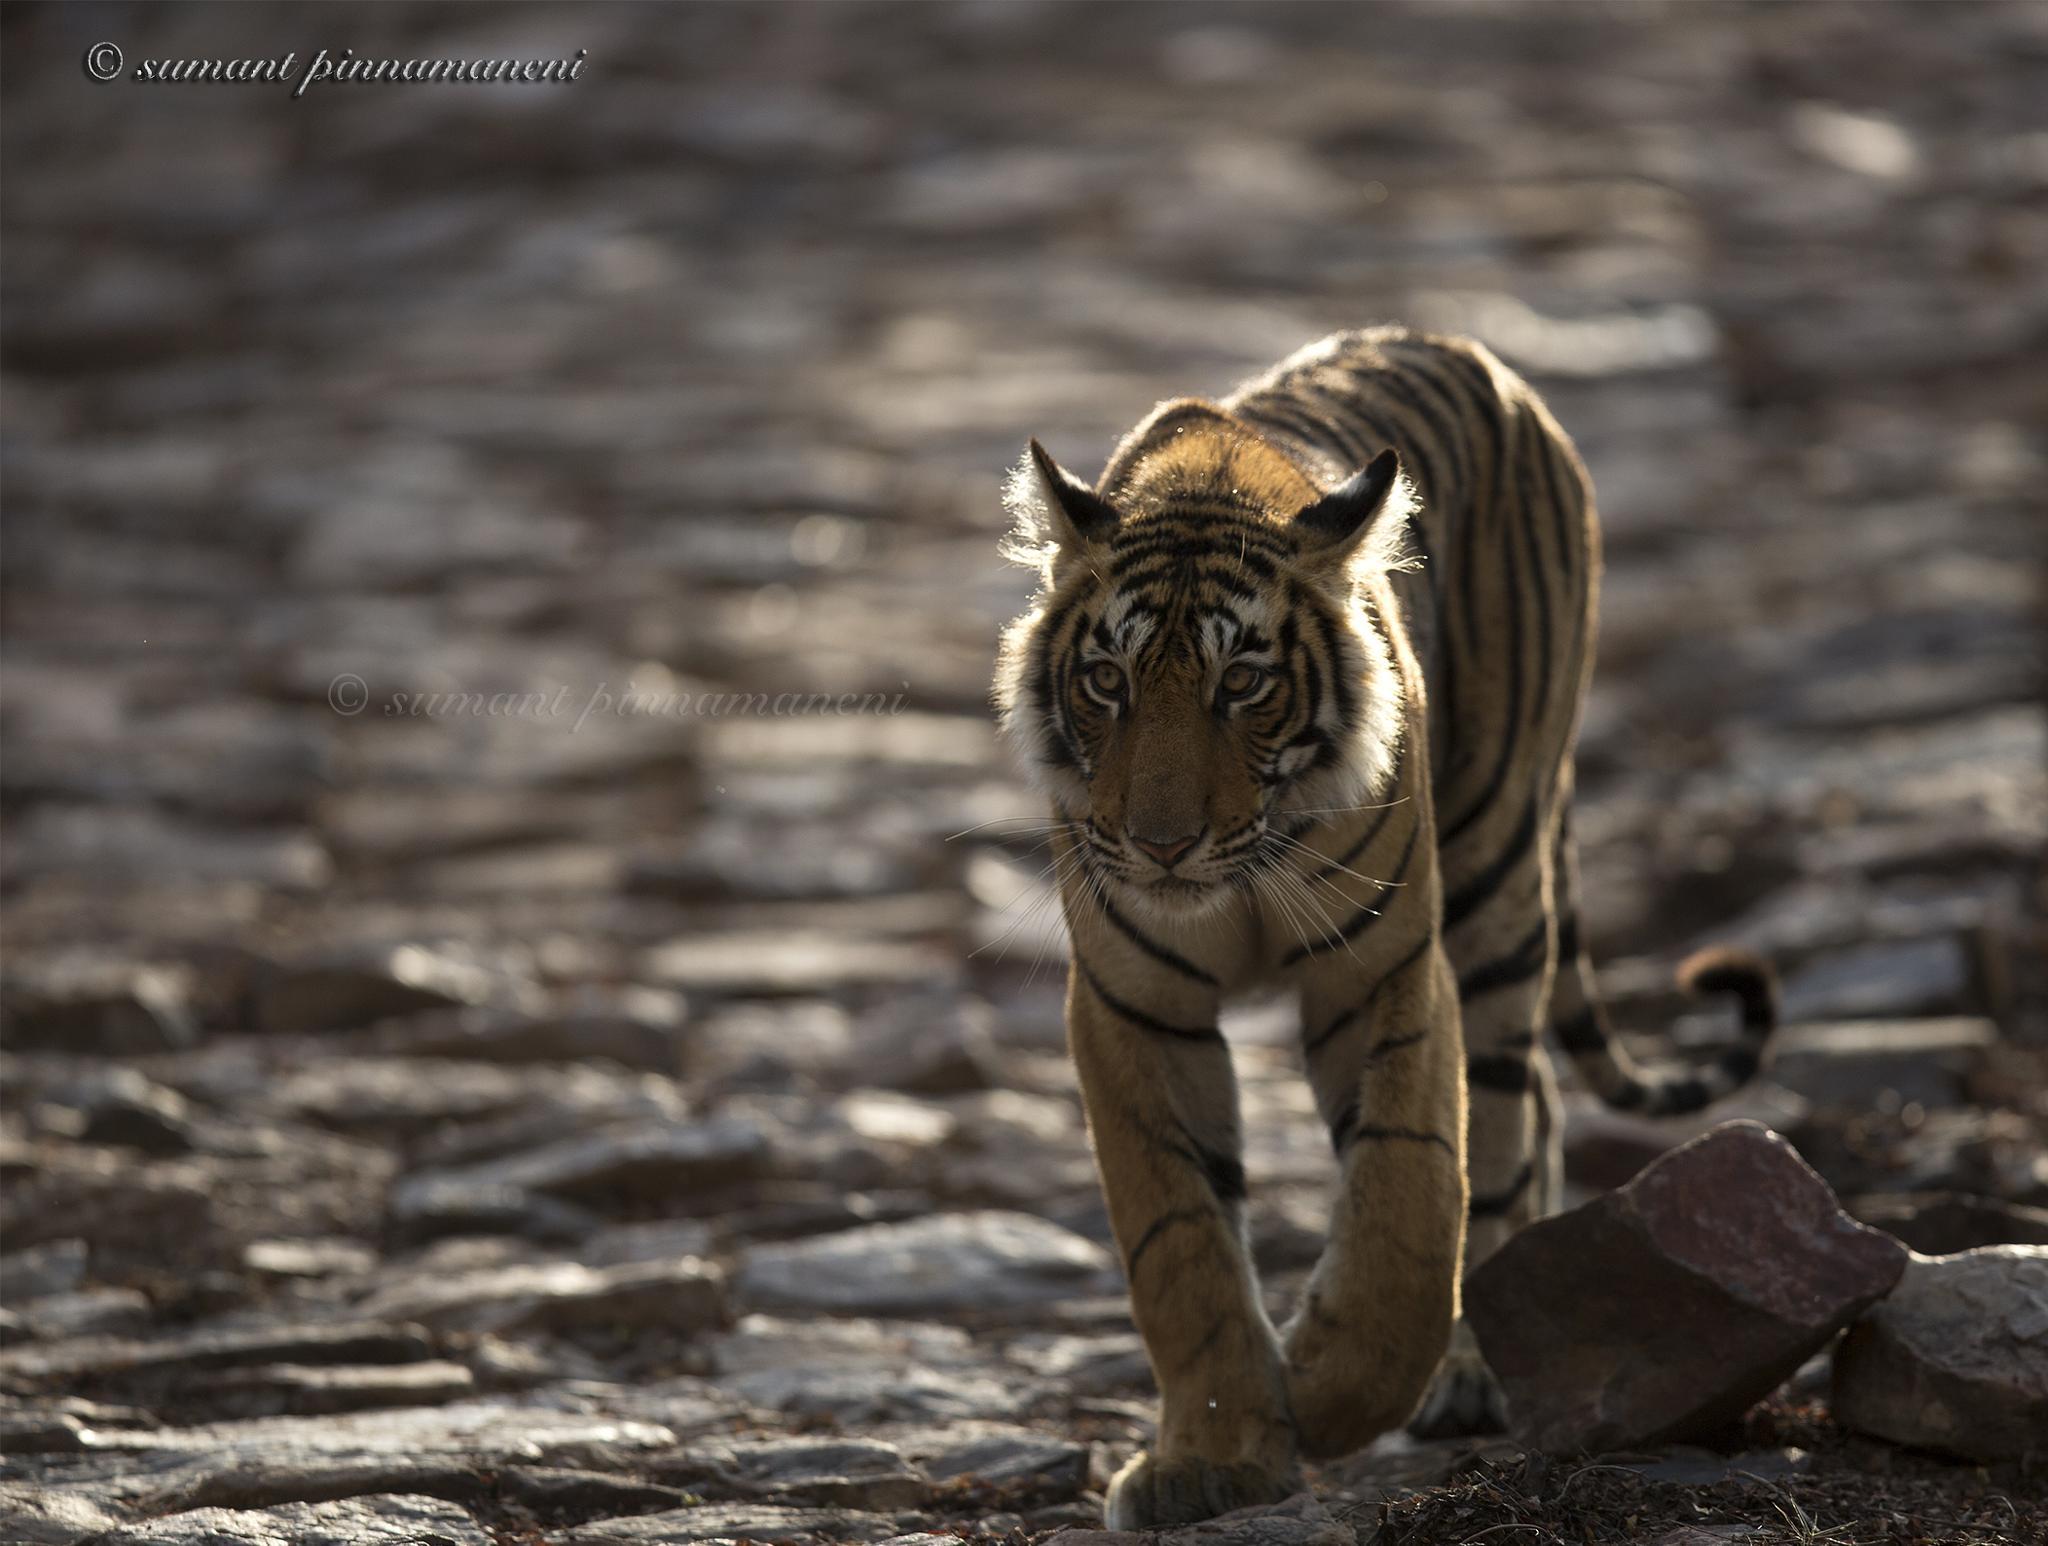 #bengaltiger #tiger by Sumant Pinnamaneni